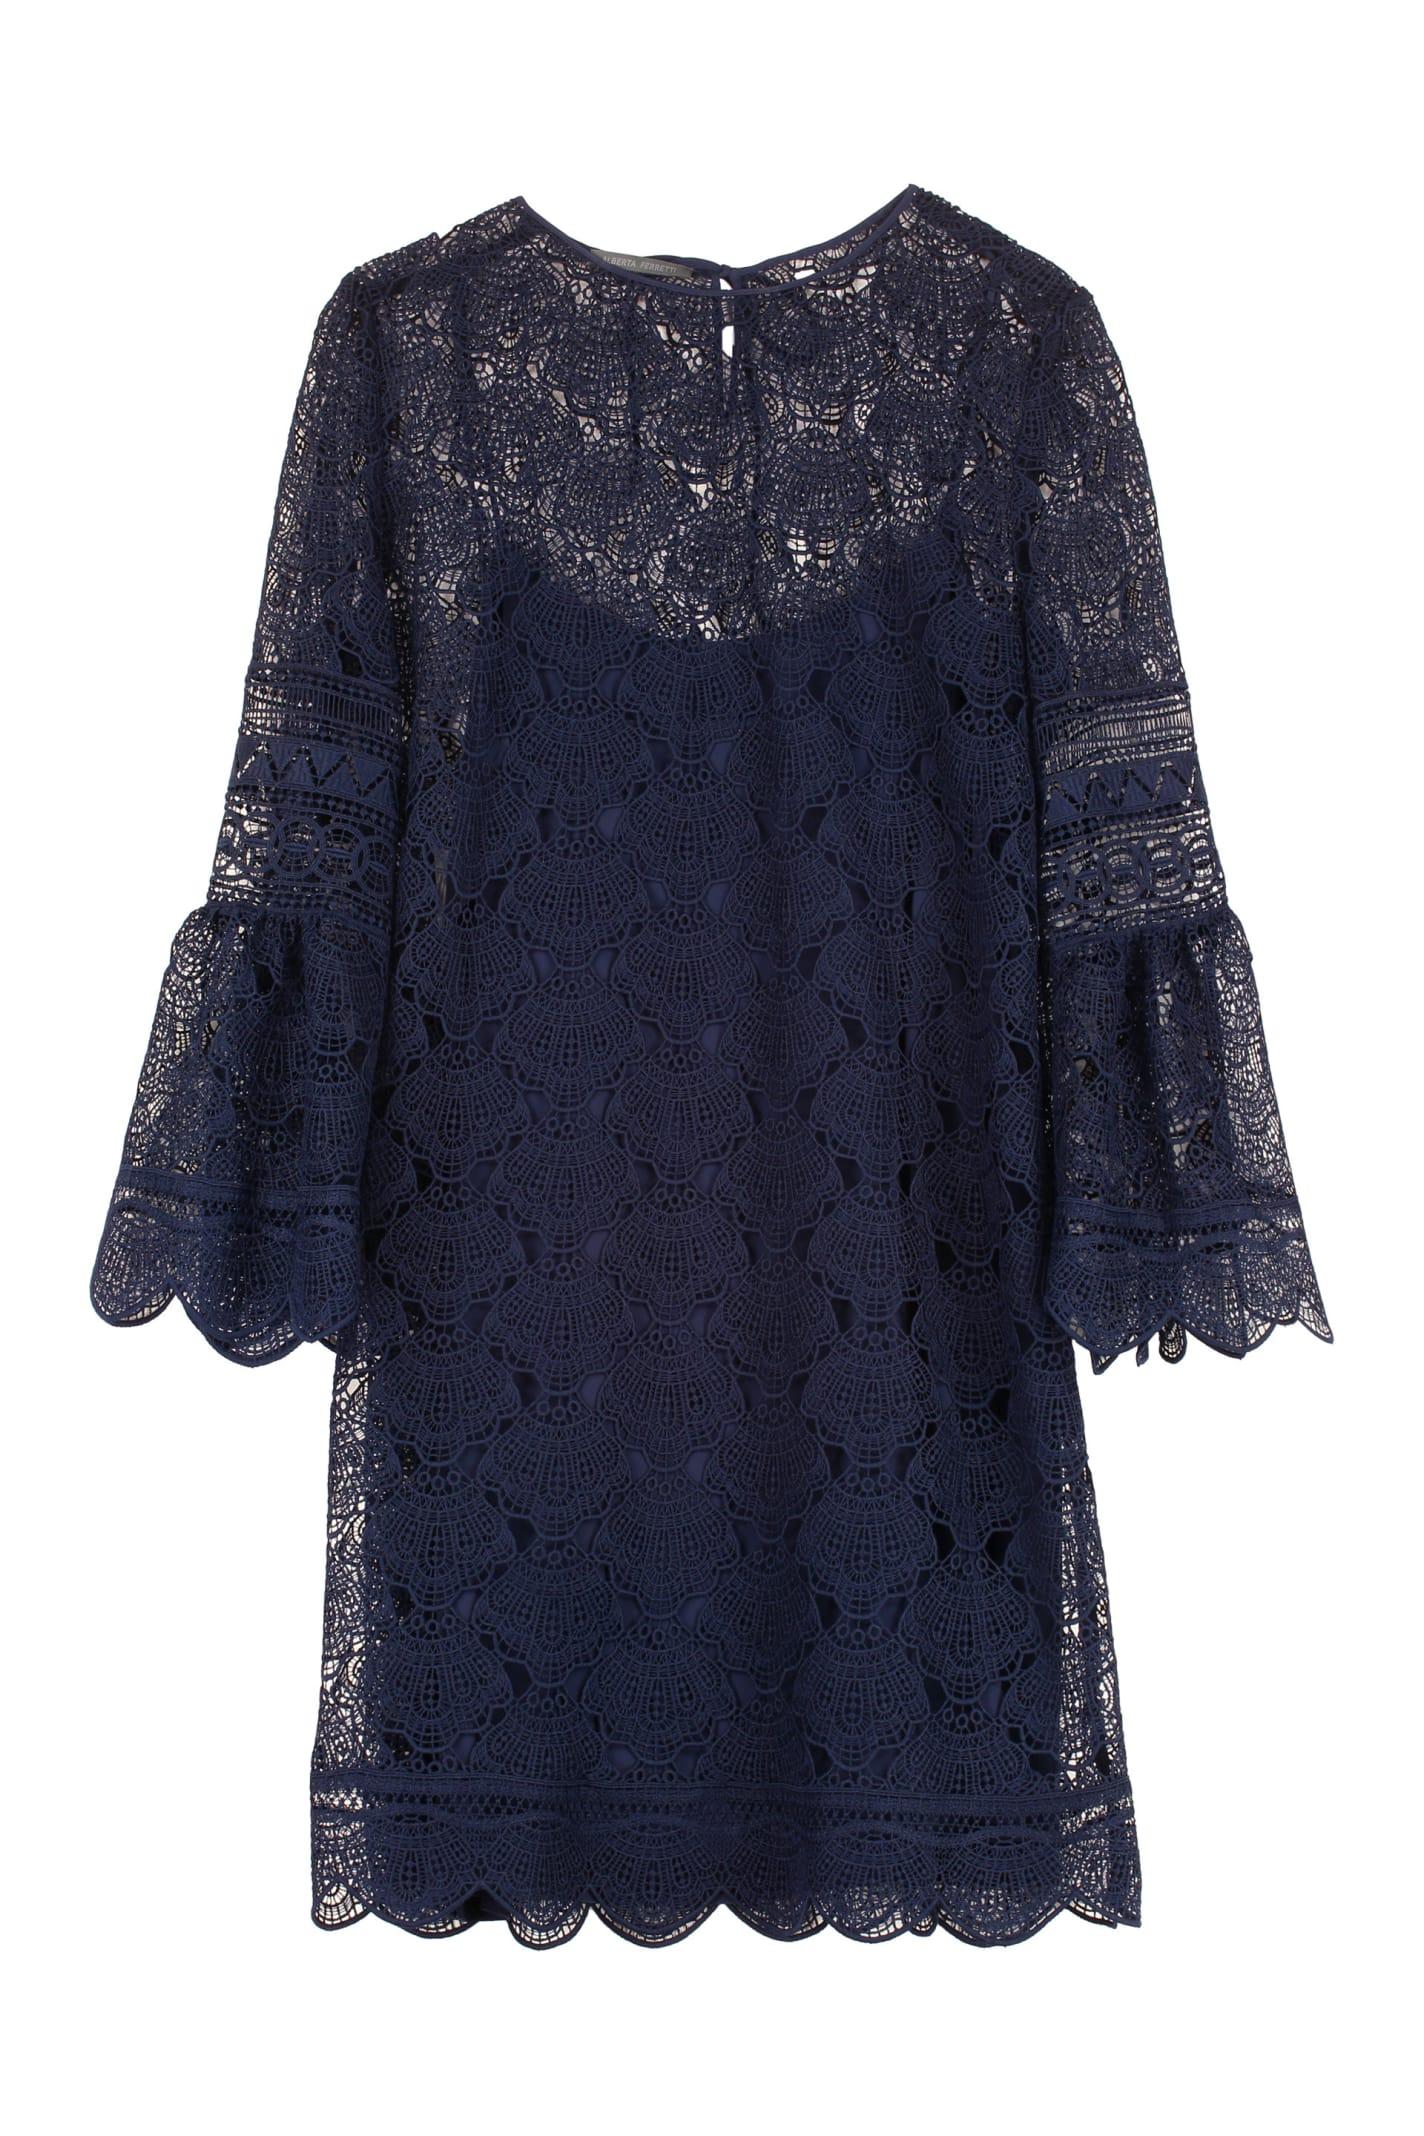 Buy Alberta Ferretti Floral Macramé-lace Dress online, shop Alberta Ferretti with free shipping